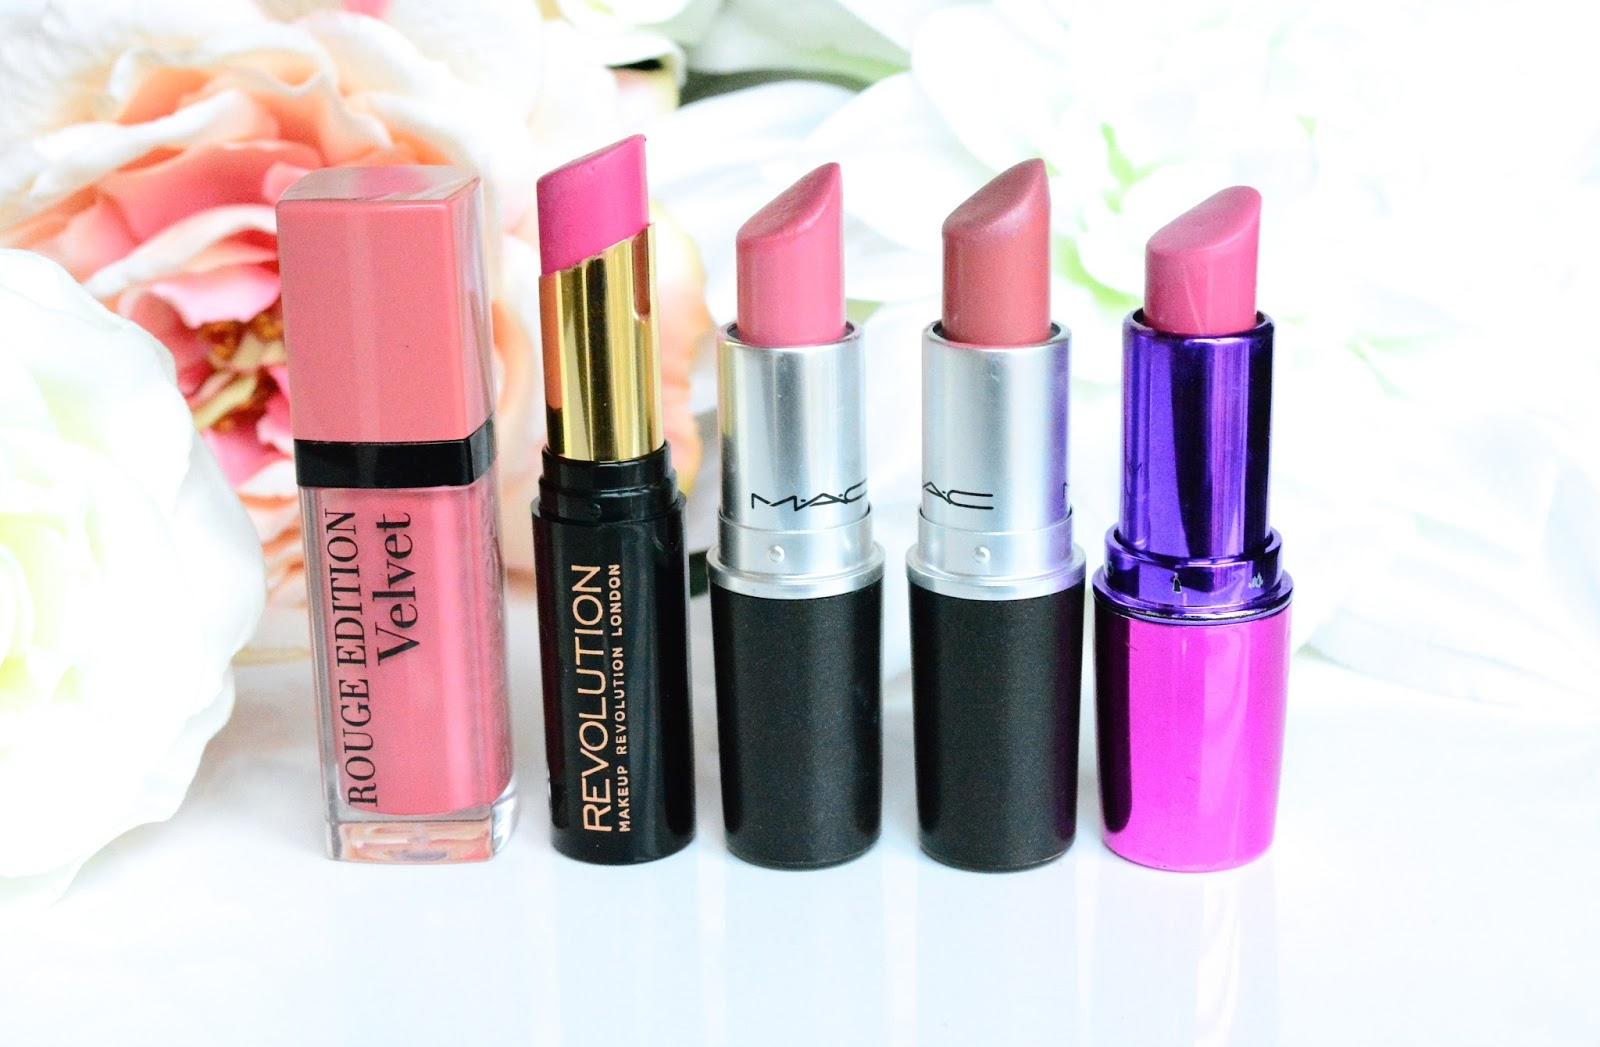 Spring Lipsticks, Mac Brave, Mac Lovelorn, Makeup Revolution, Ken Will Want Me, She's Up All Night, Bourjois Rouge Edition Velvet